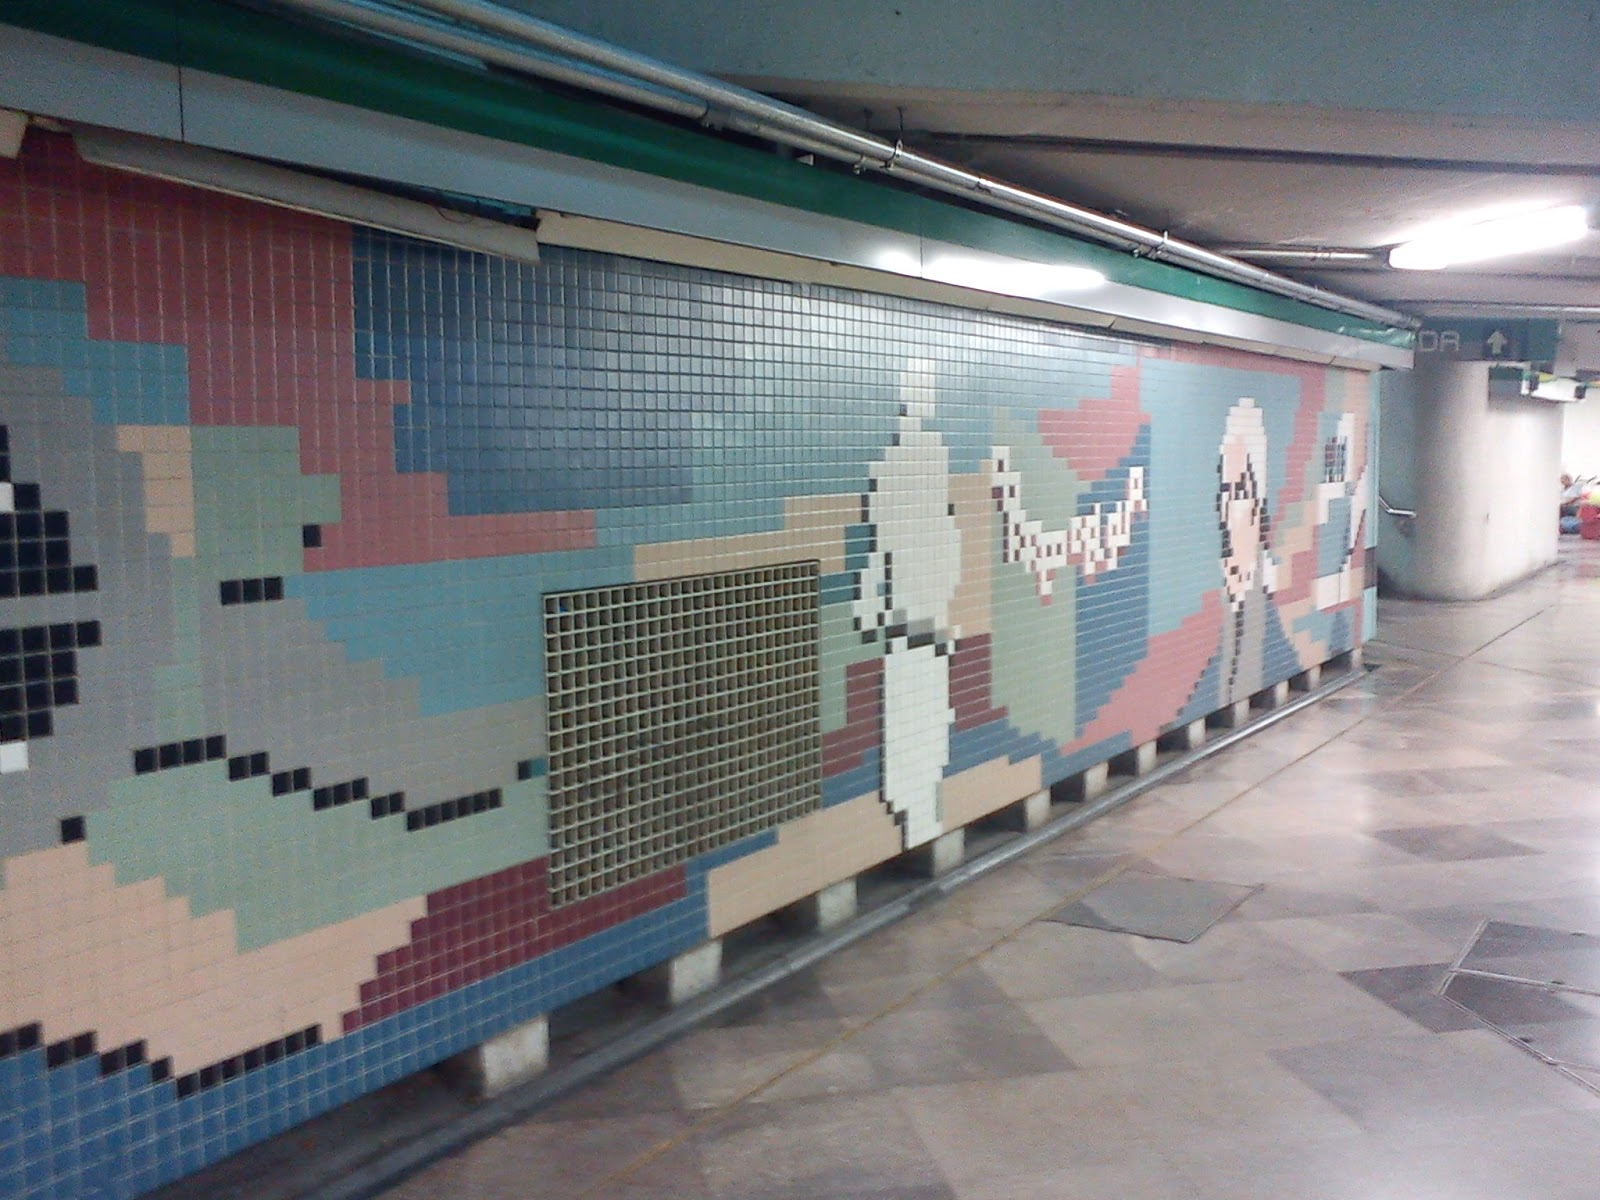 Stc Metro Linea 4 Morelos Miradas